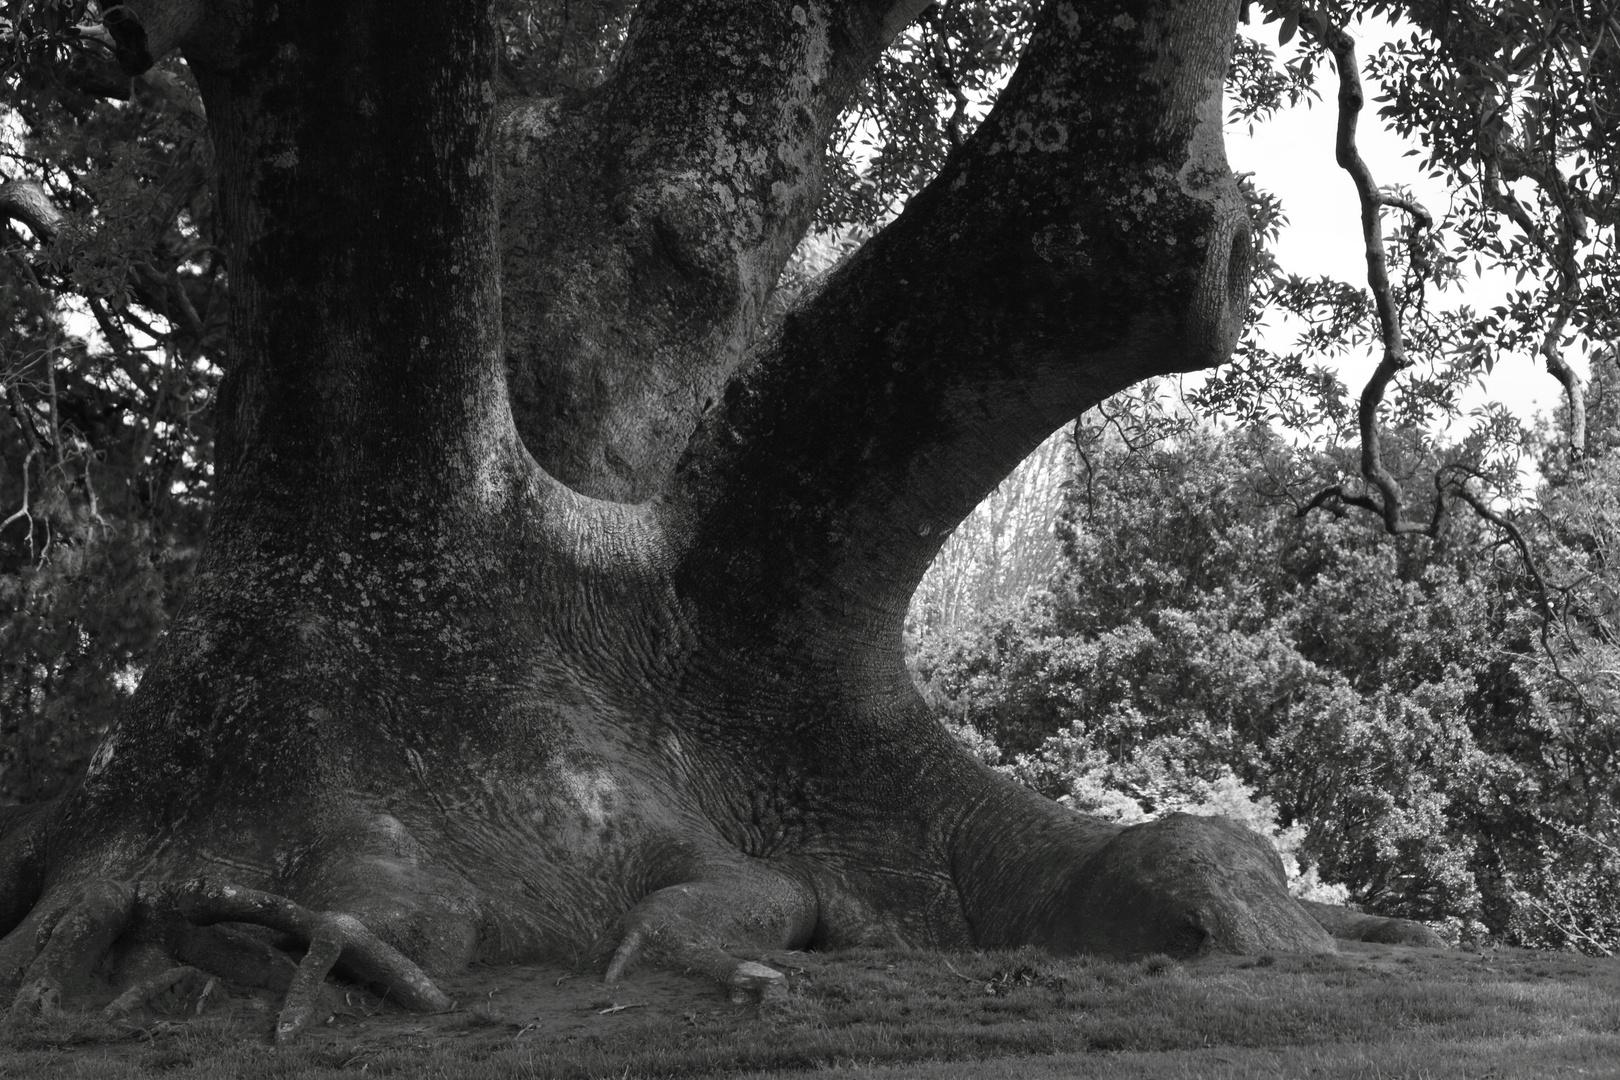 the Elephant Tree*